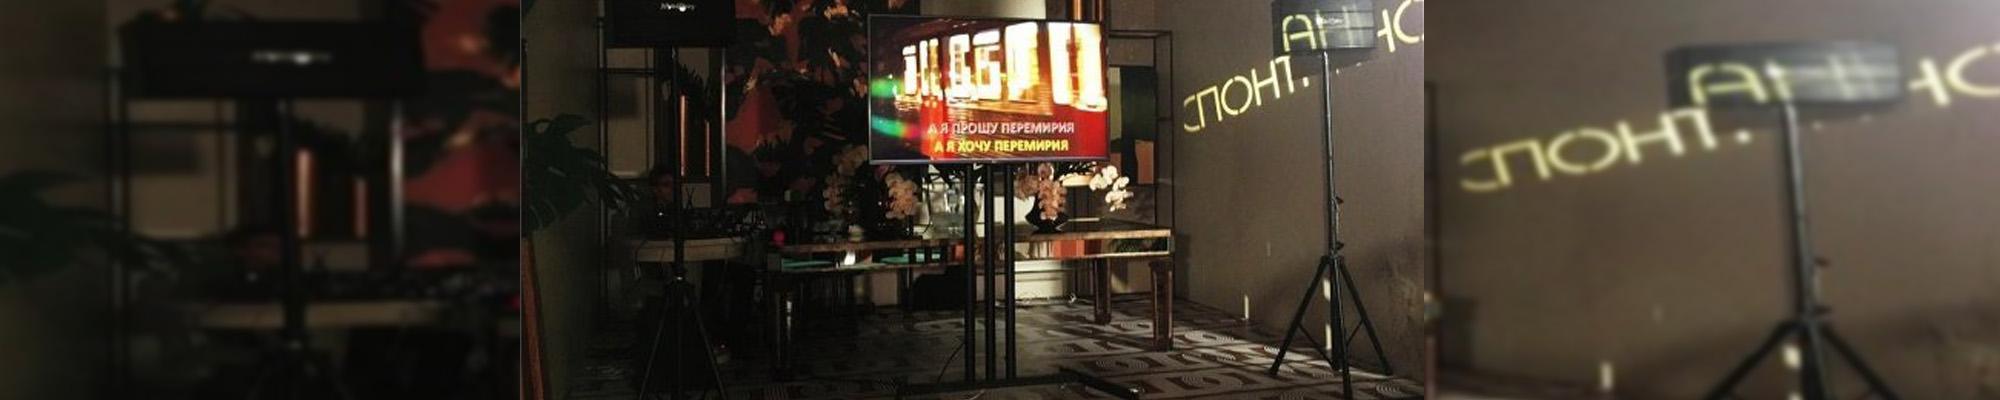 arenda Karaoke